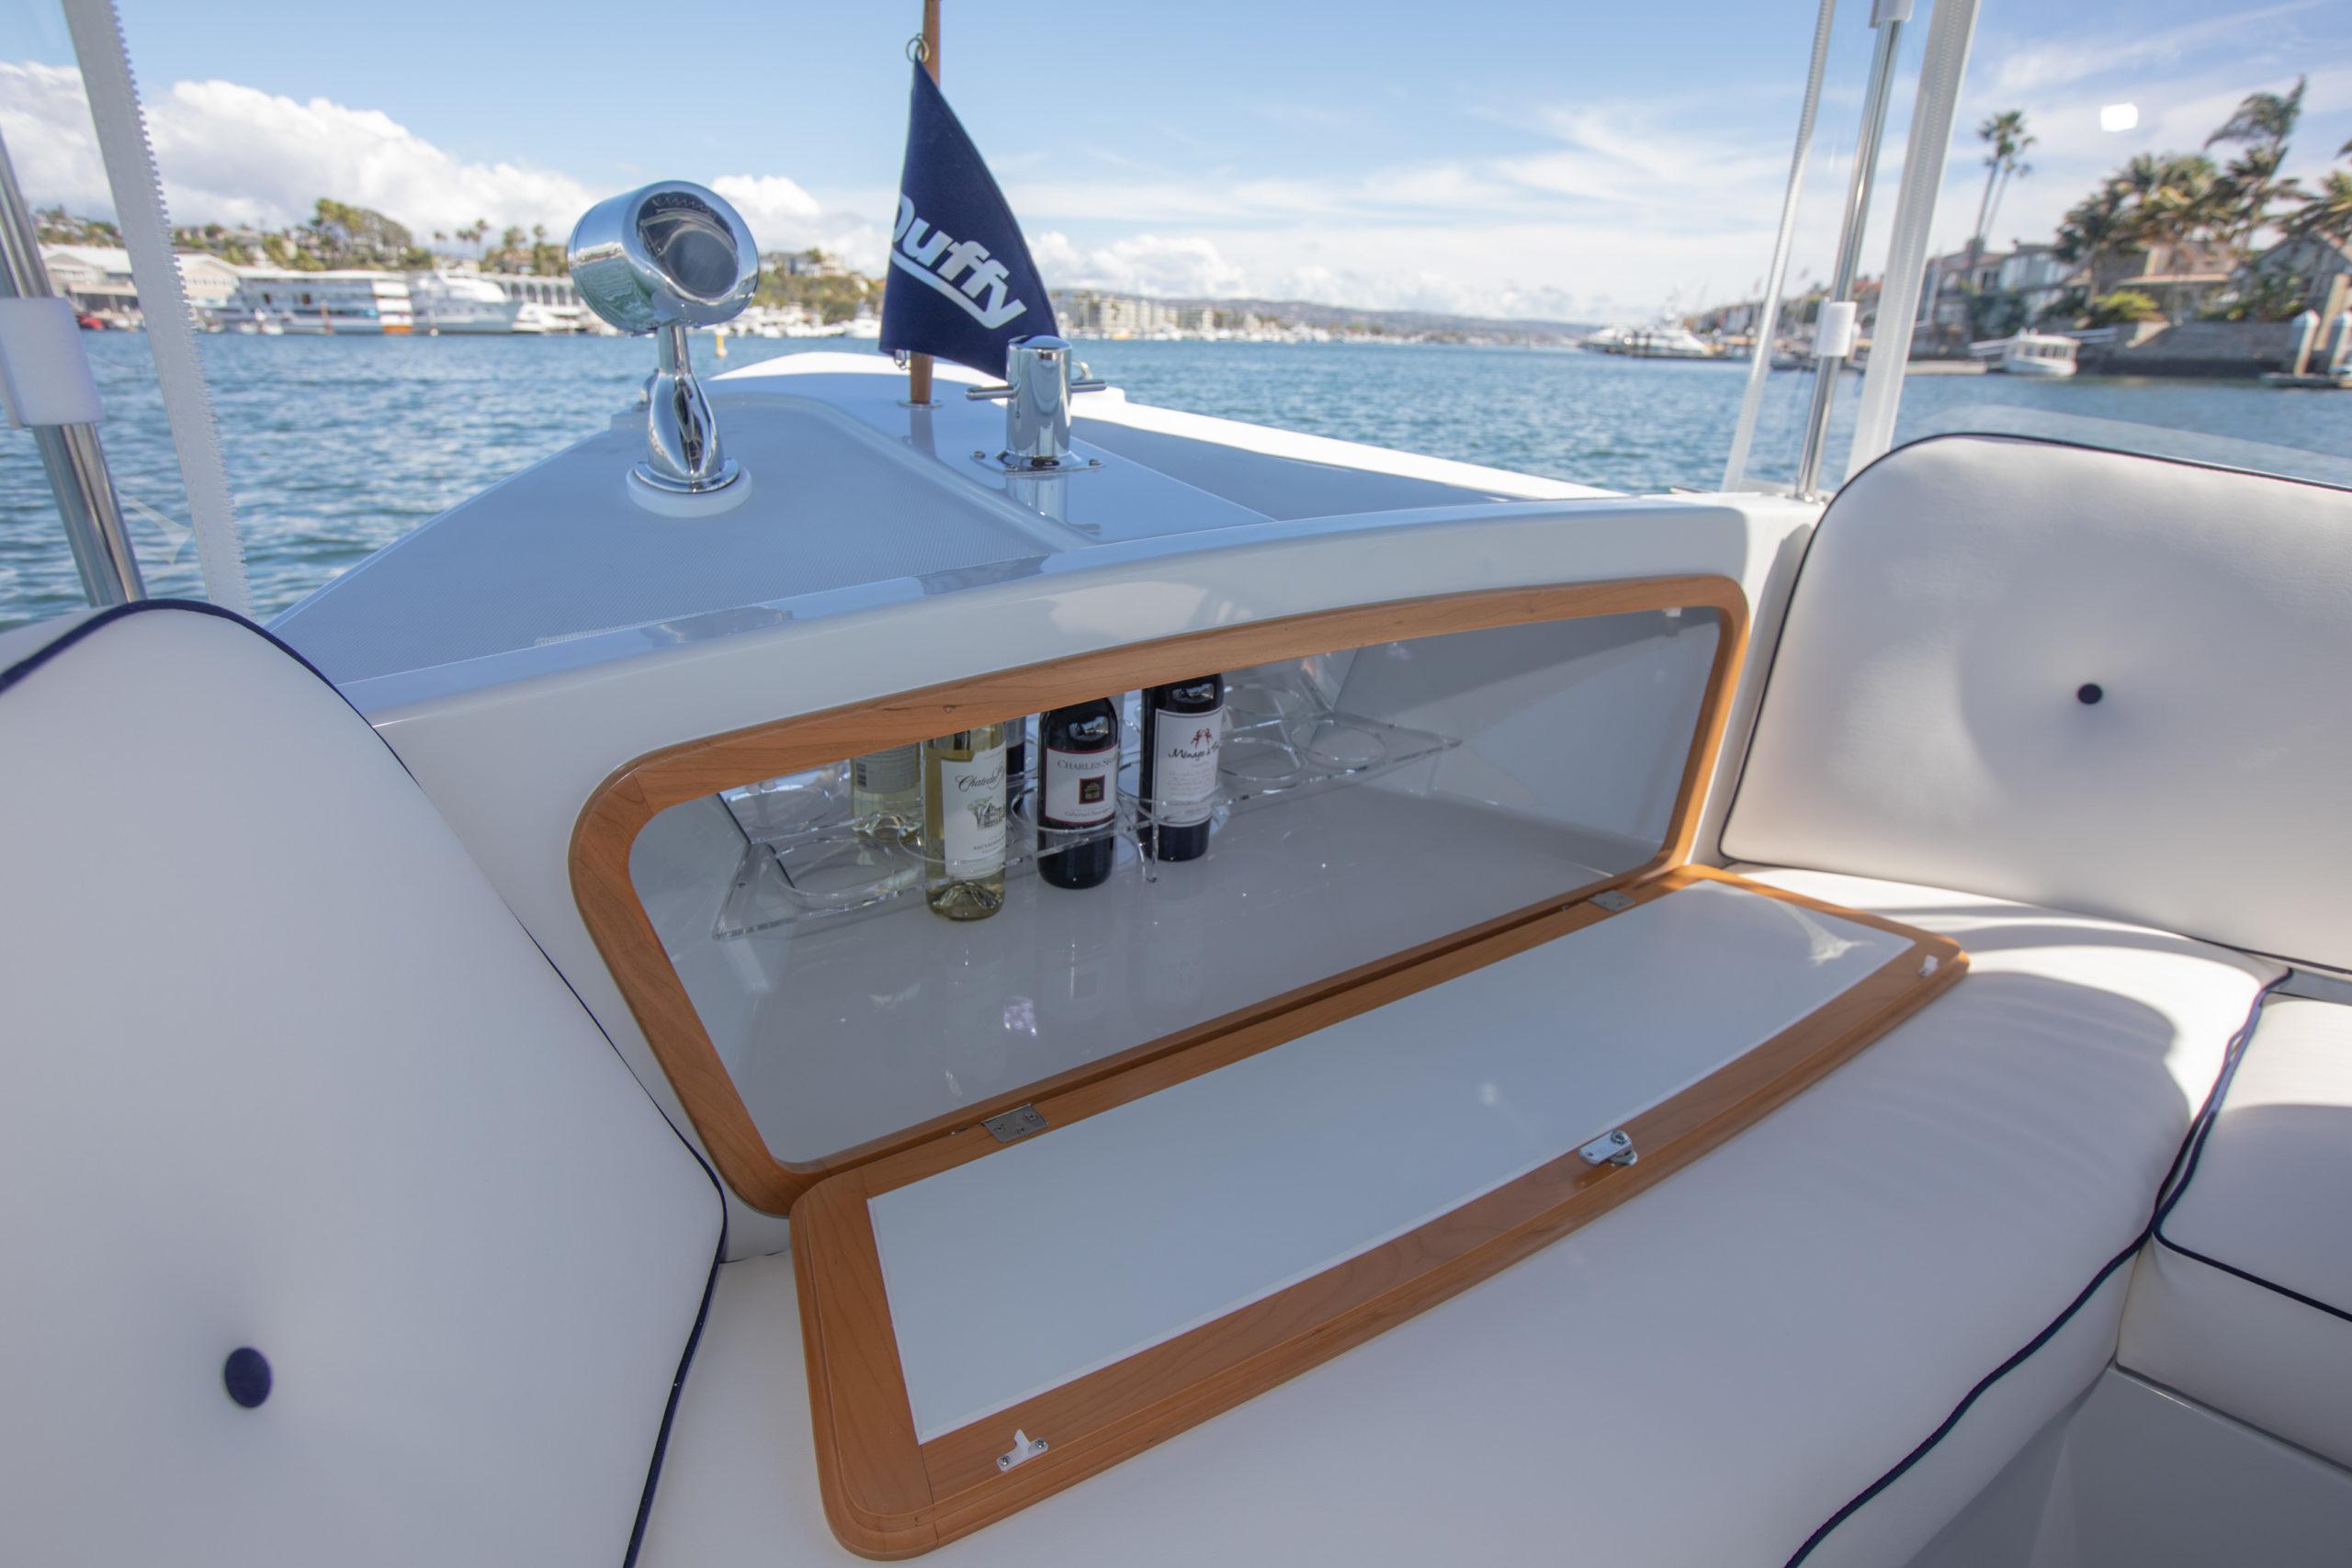 Duffy-Electric-Boats-22-Sun-Cruiser-Interior-2020-16